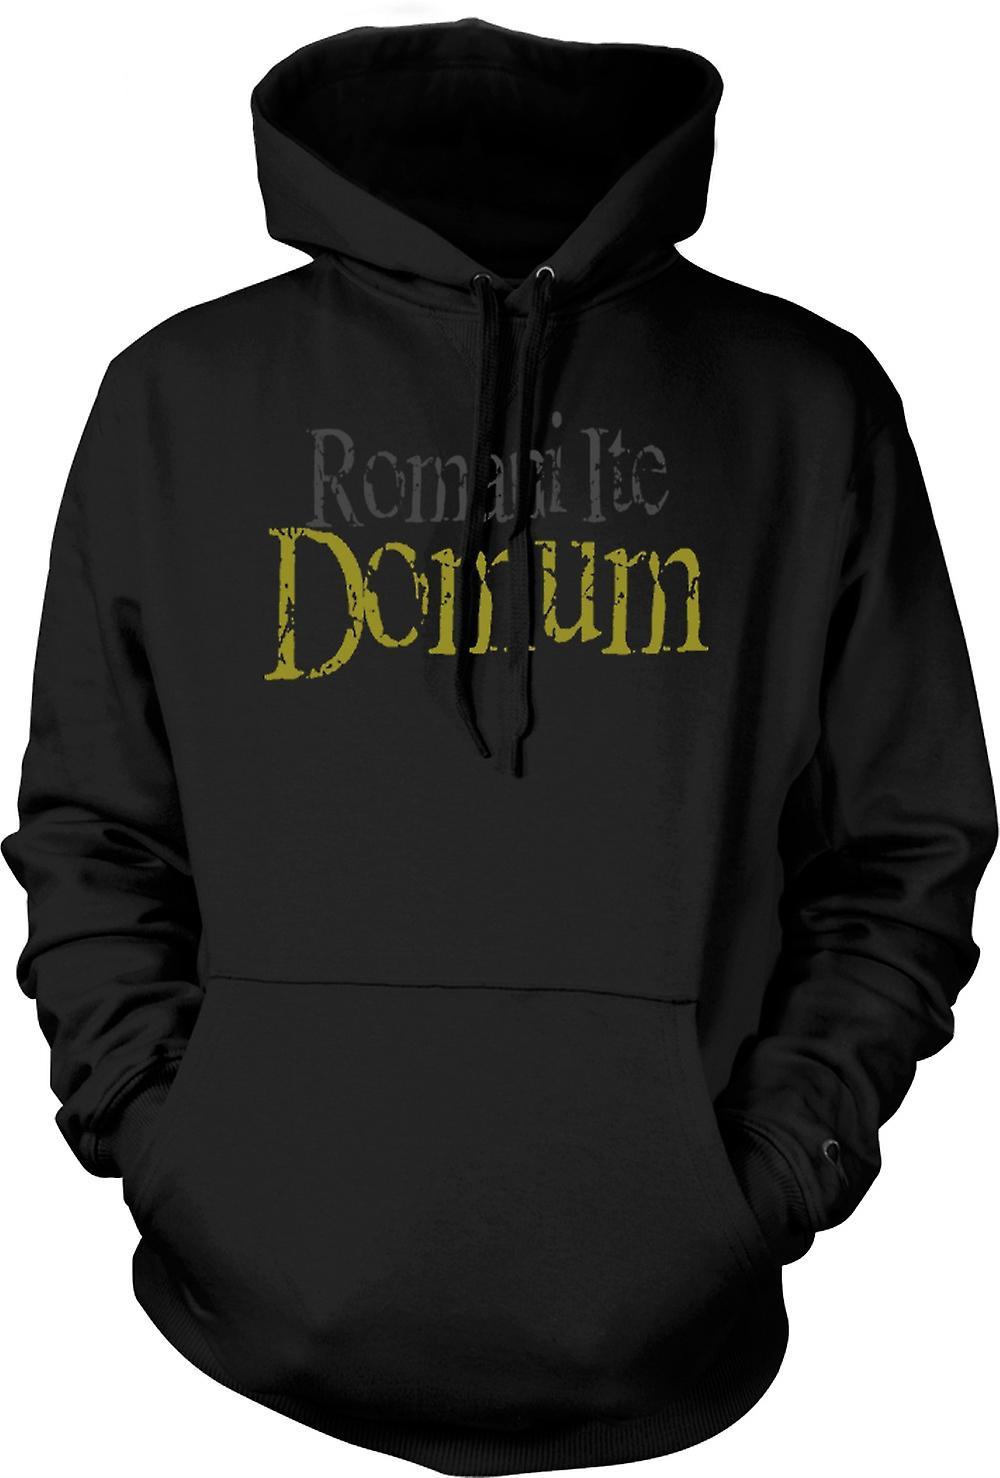 Mens Hoodie - Romani Ite Domum - Funny